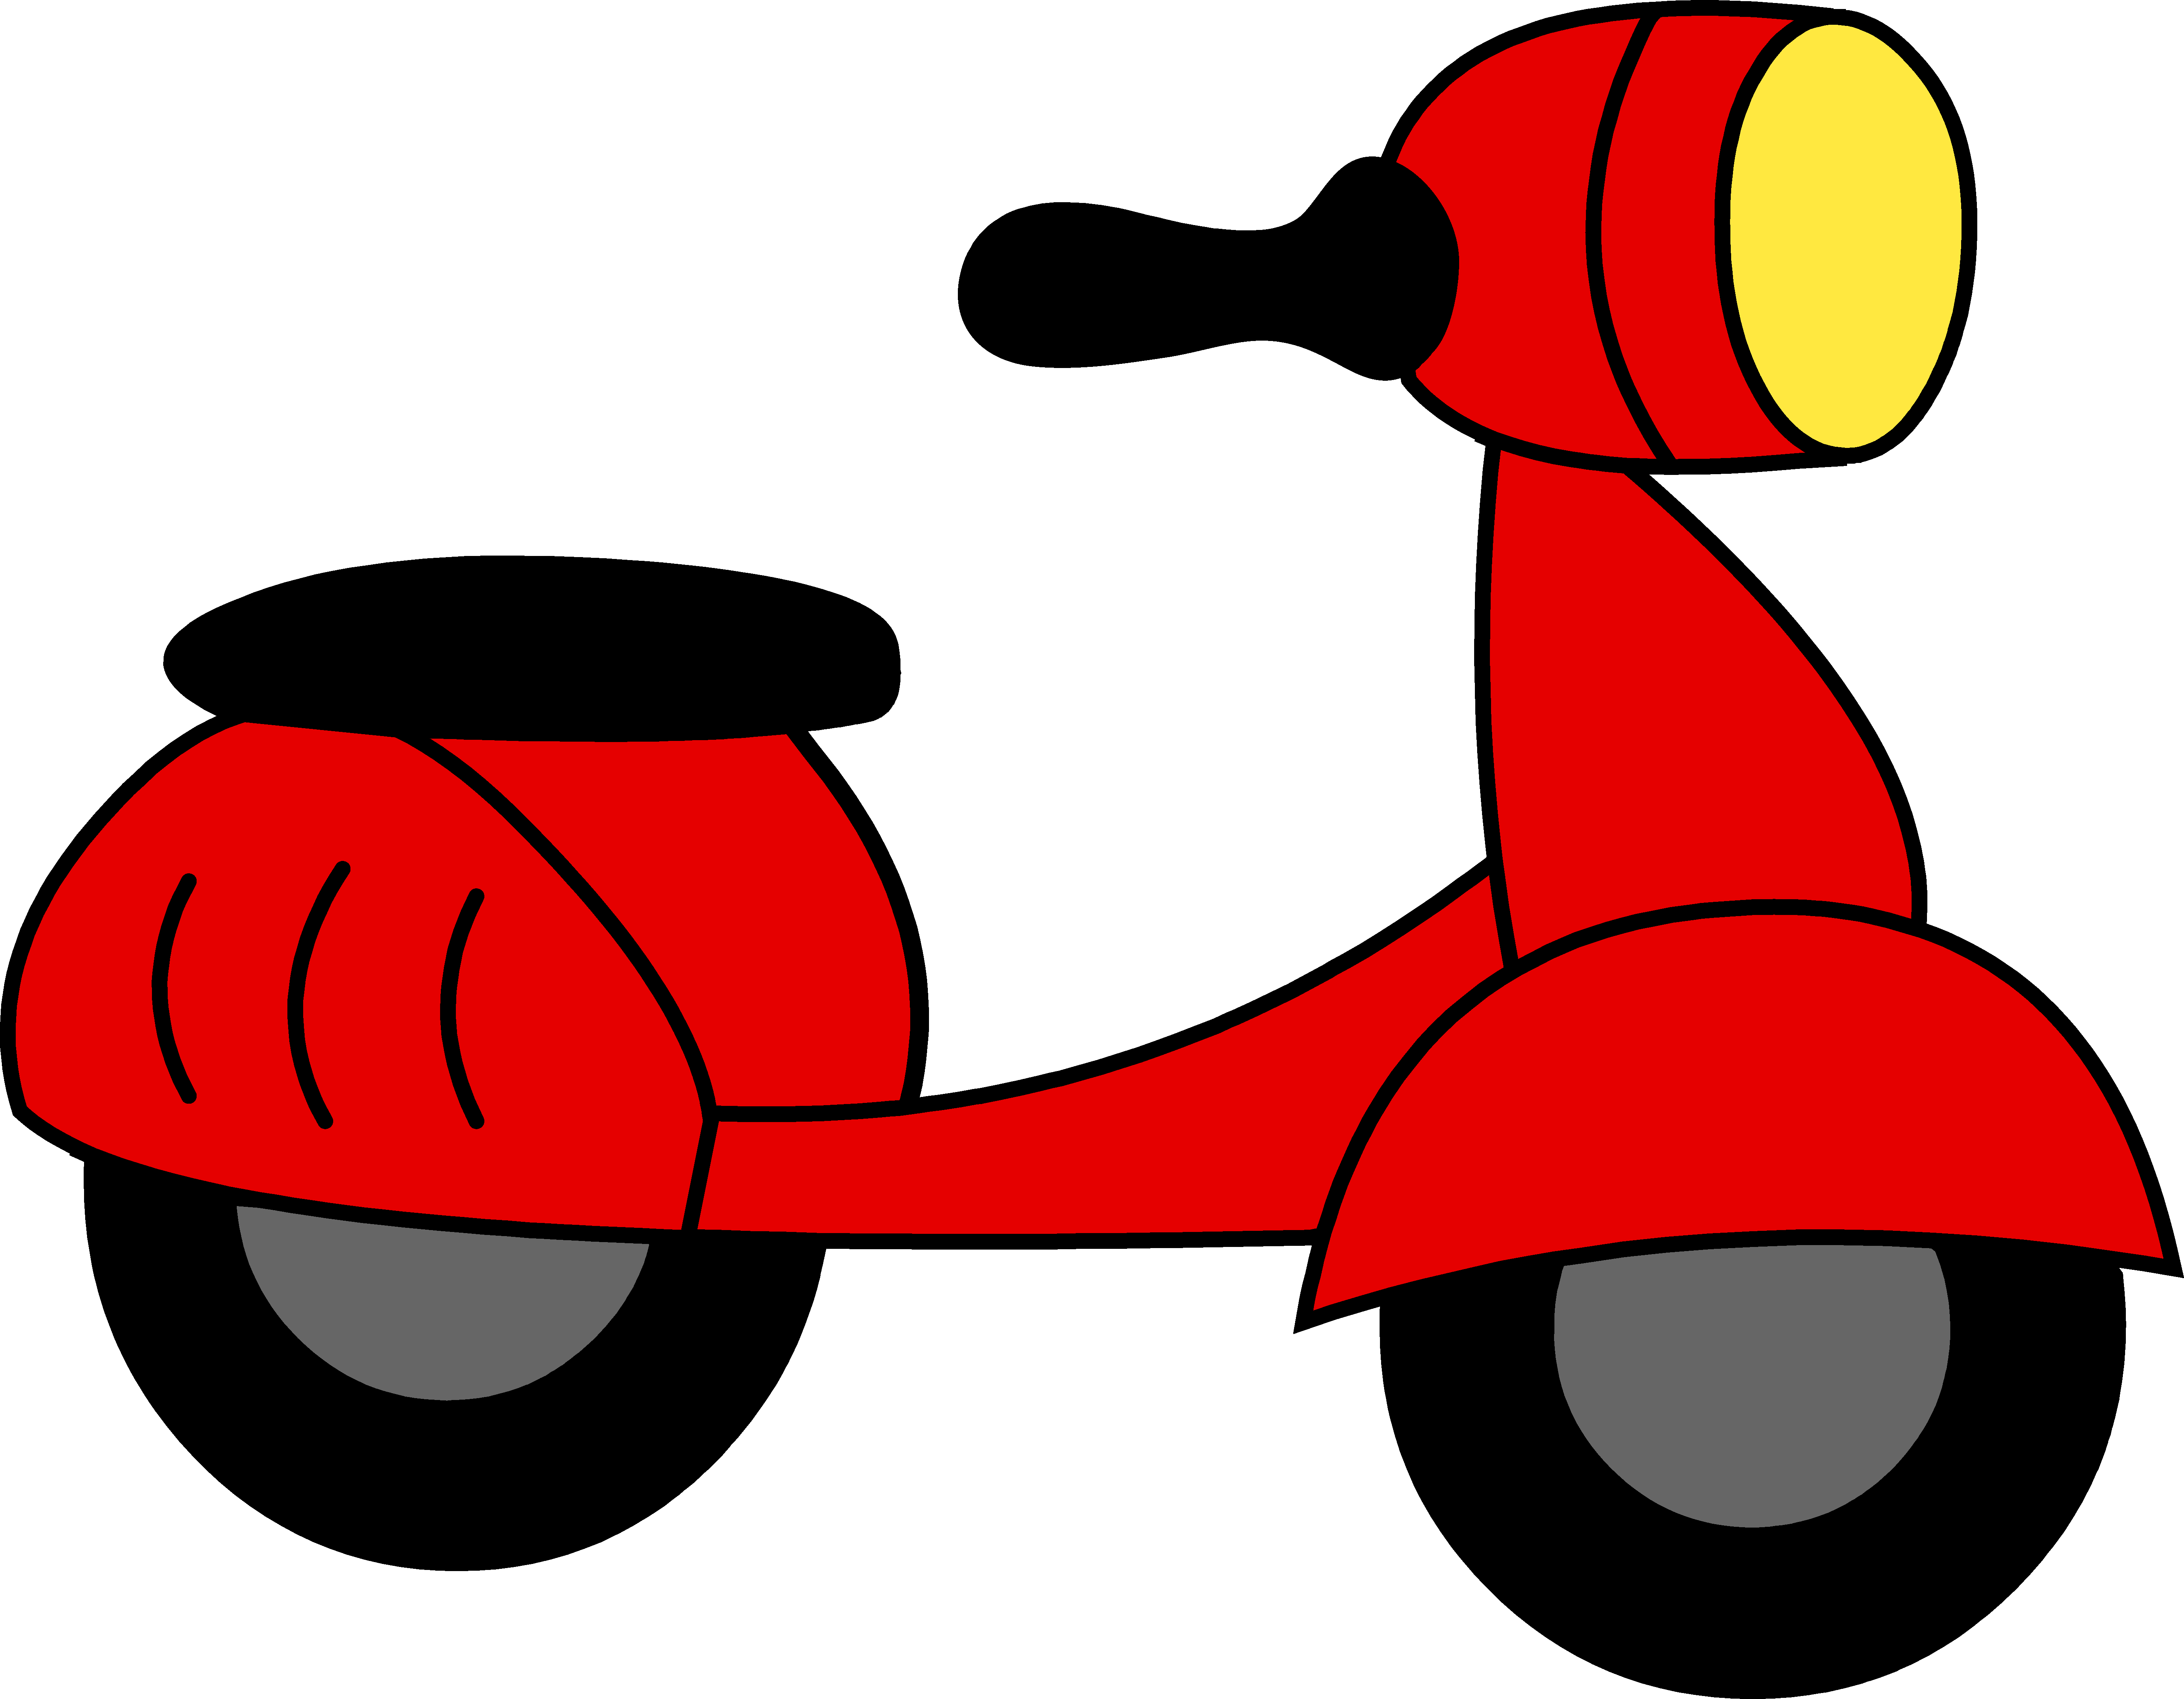 Motor clipart #4, Download drawings